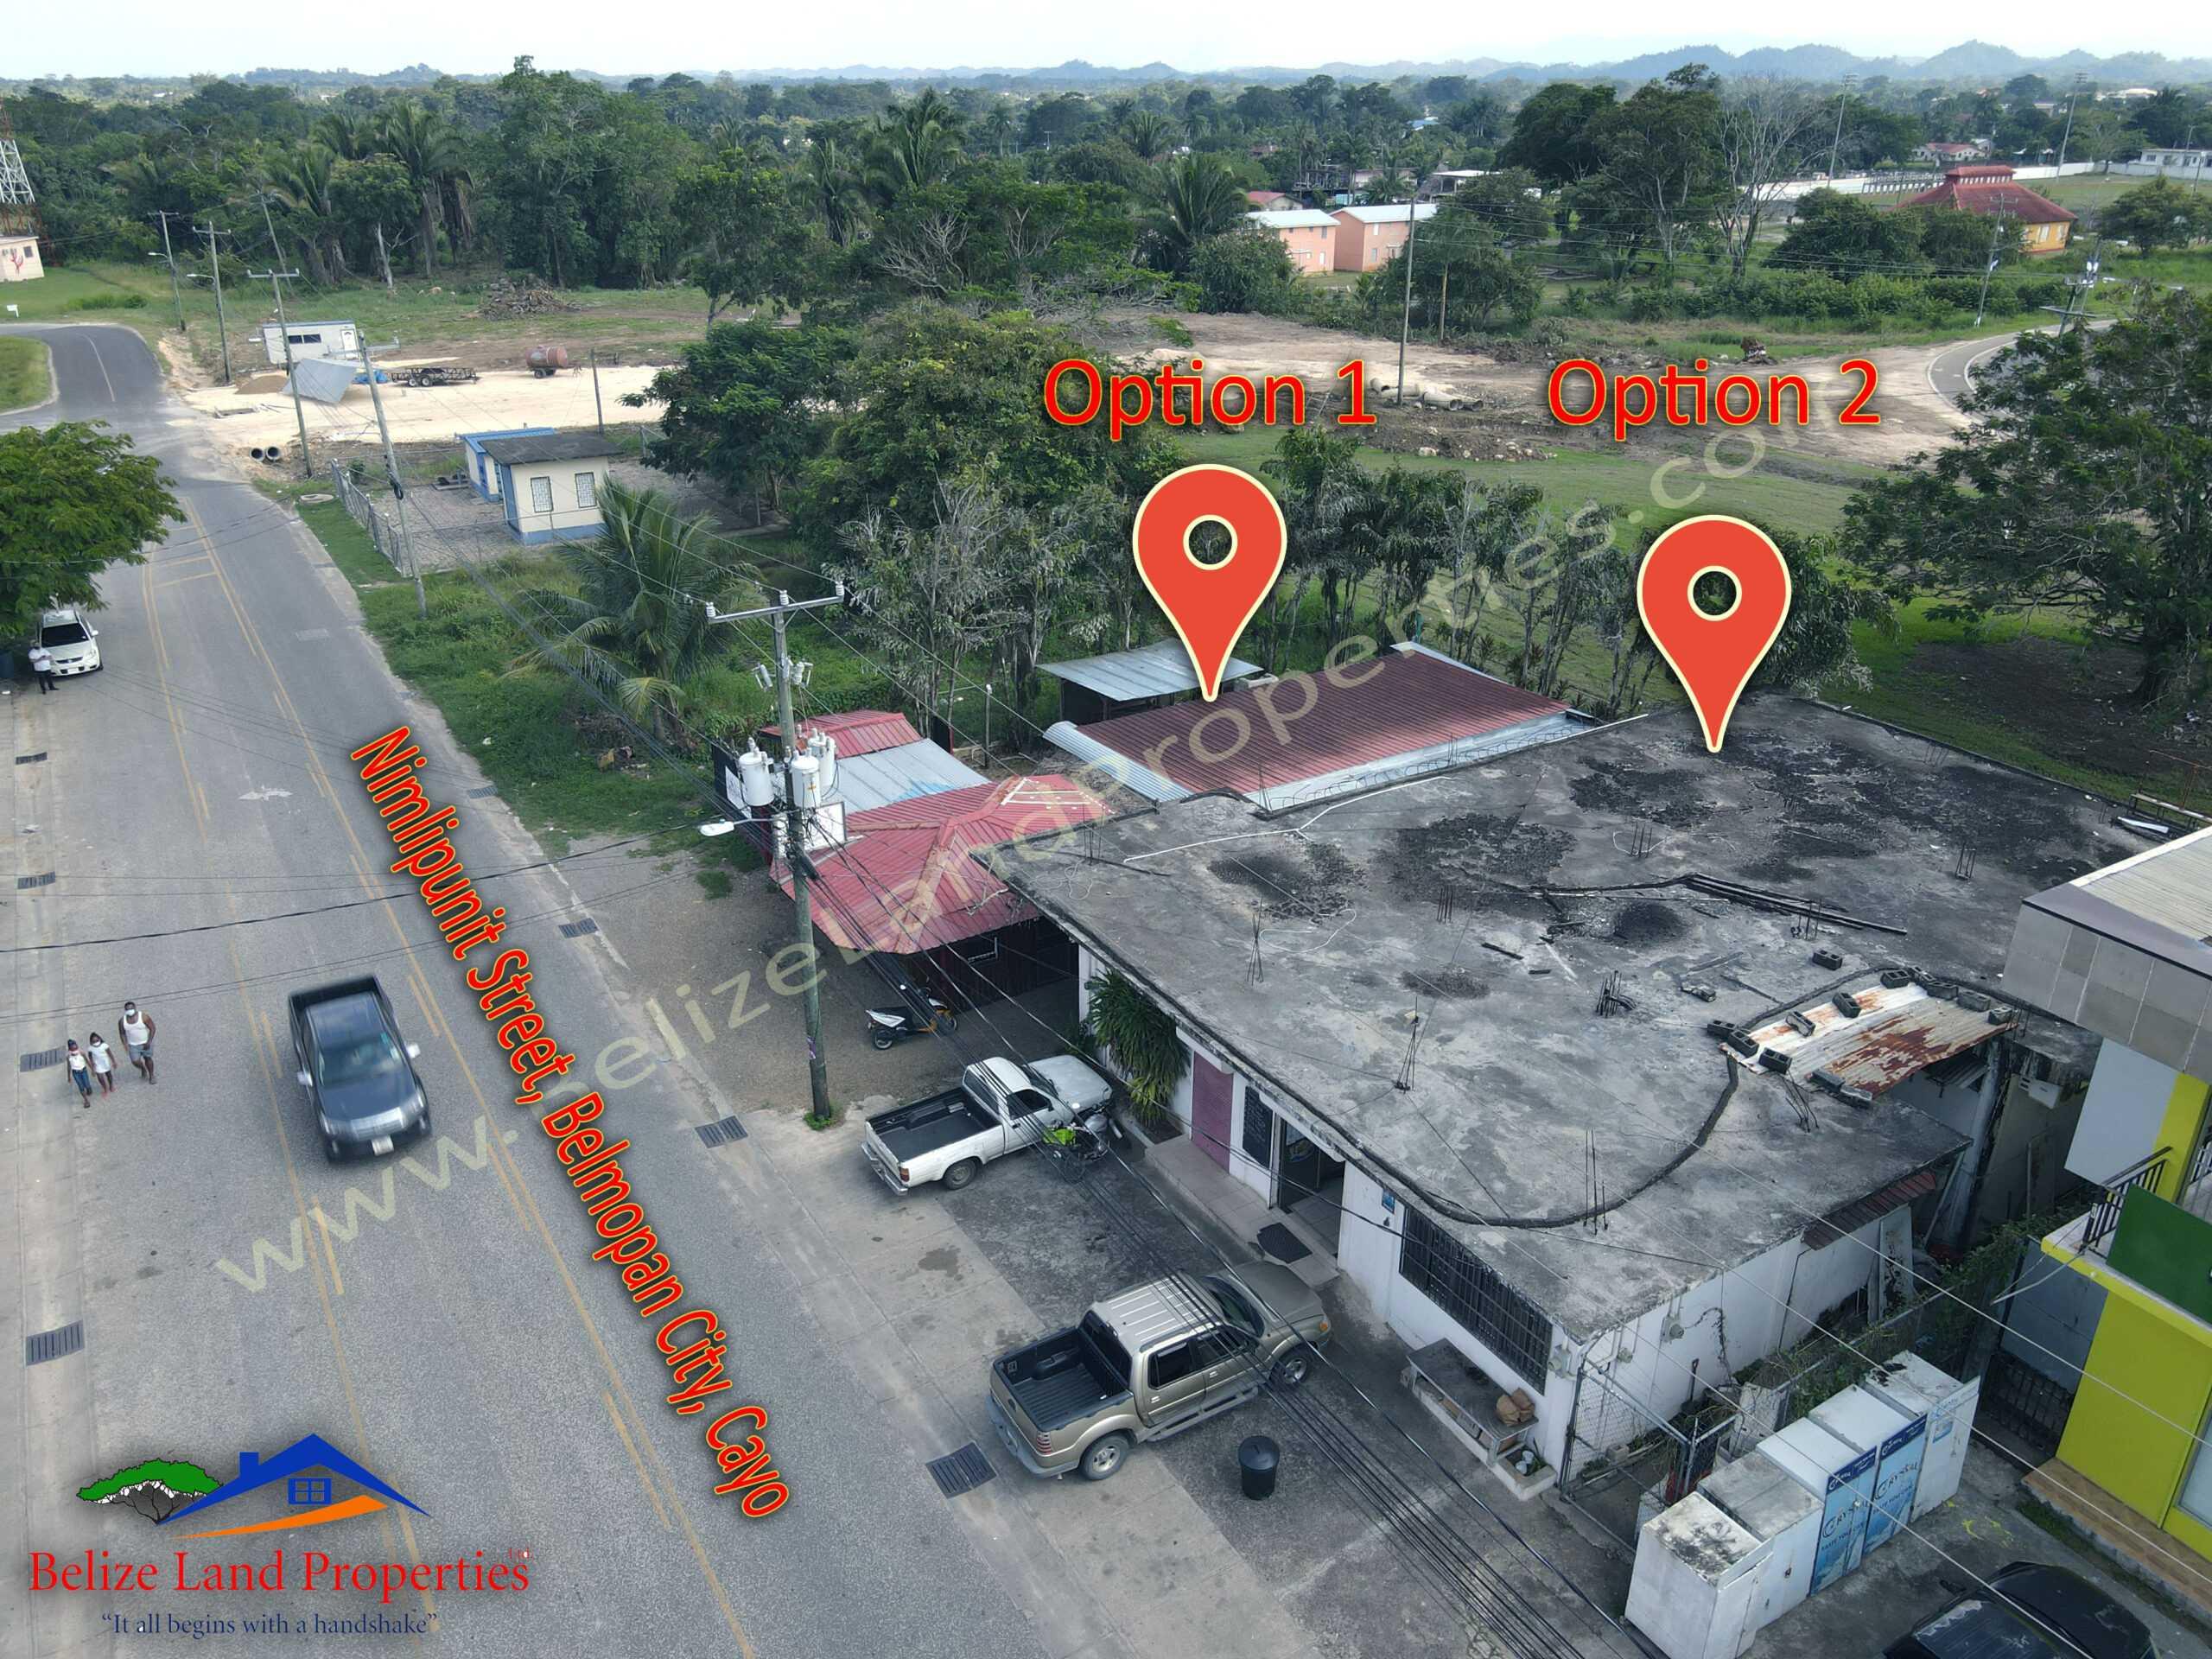 CY109: Option 2- Commercial Rental Income Property For Sale in Belmopan City on Nimlipunit Street, Cayo! Belize Real Estate Land Sales Belize